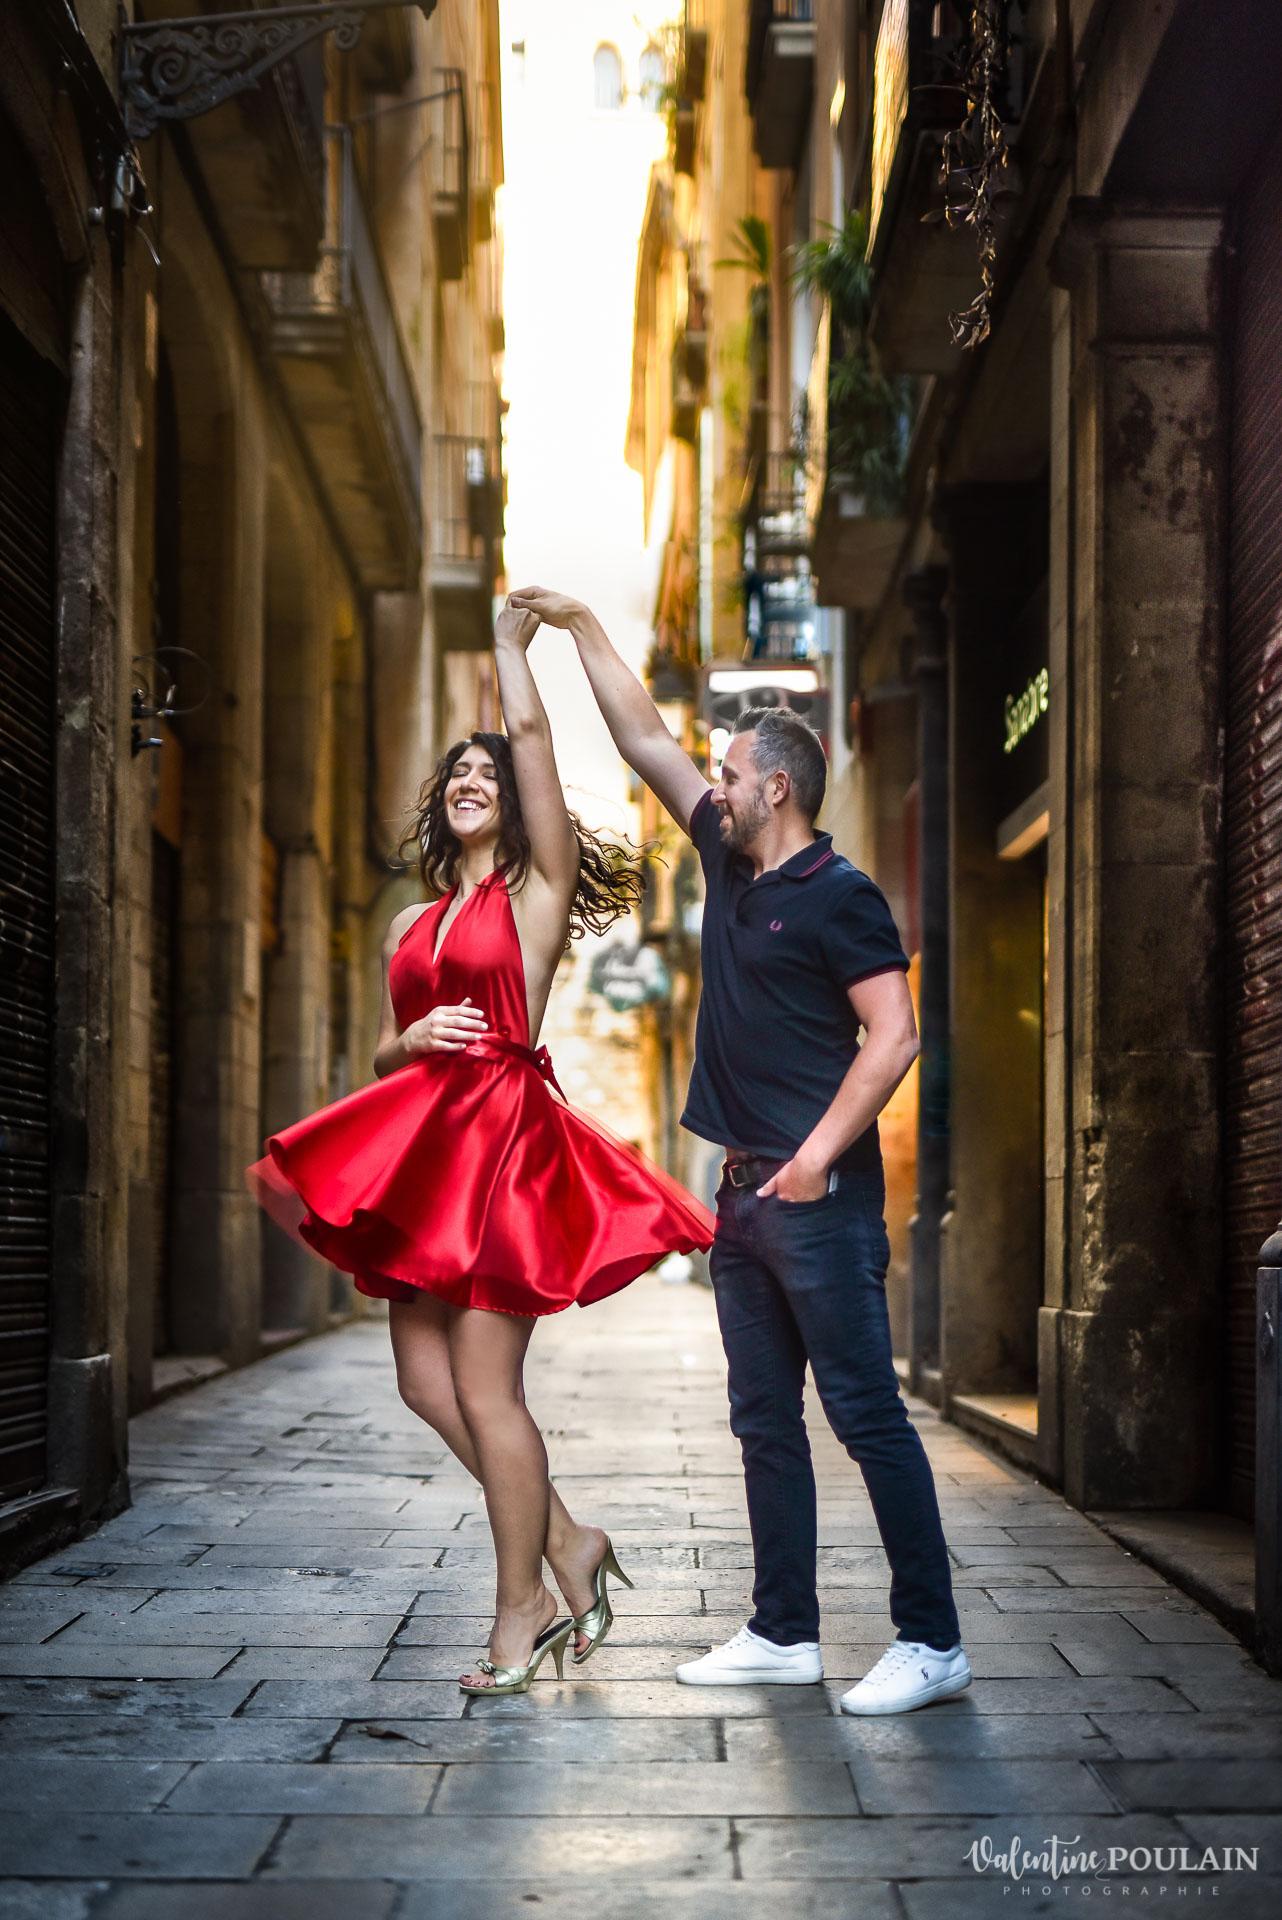 Séance photo couple Barcelone - Valentine Poulain robe créatrice